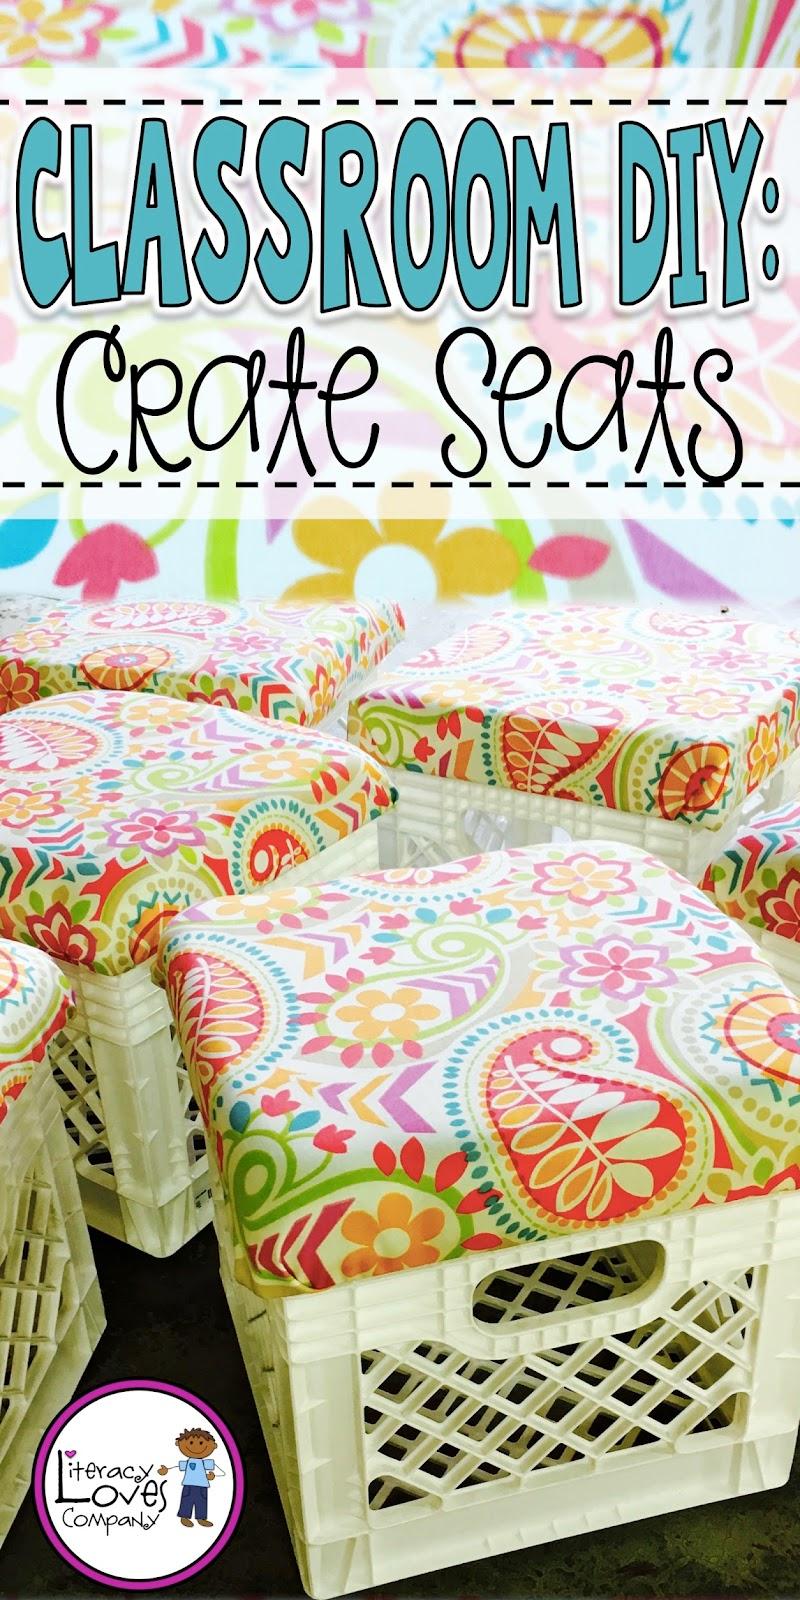 Classroom Decor Companies ~ Literacy loves company classroom diy crate seats